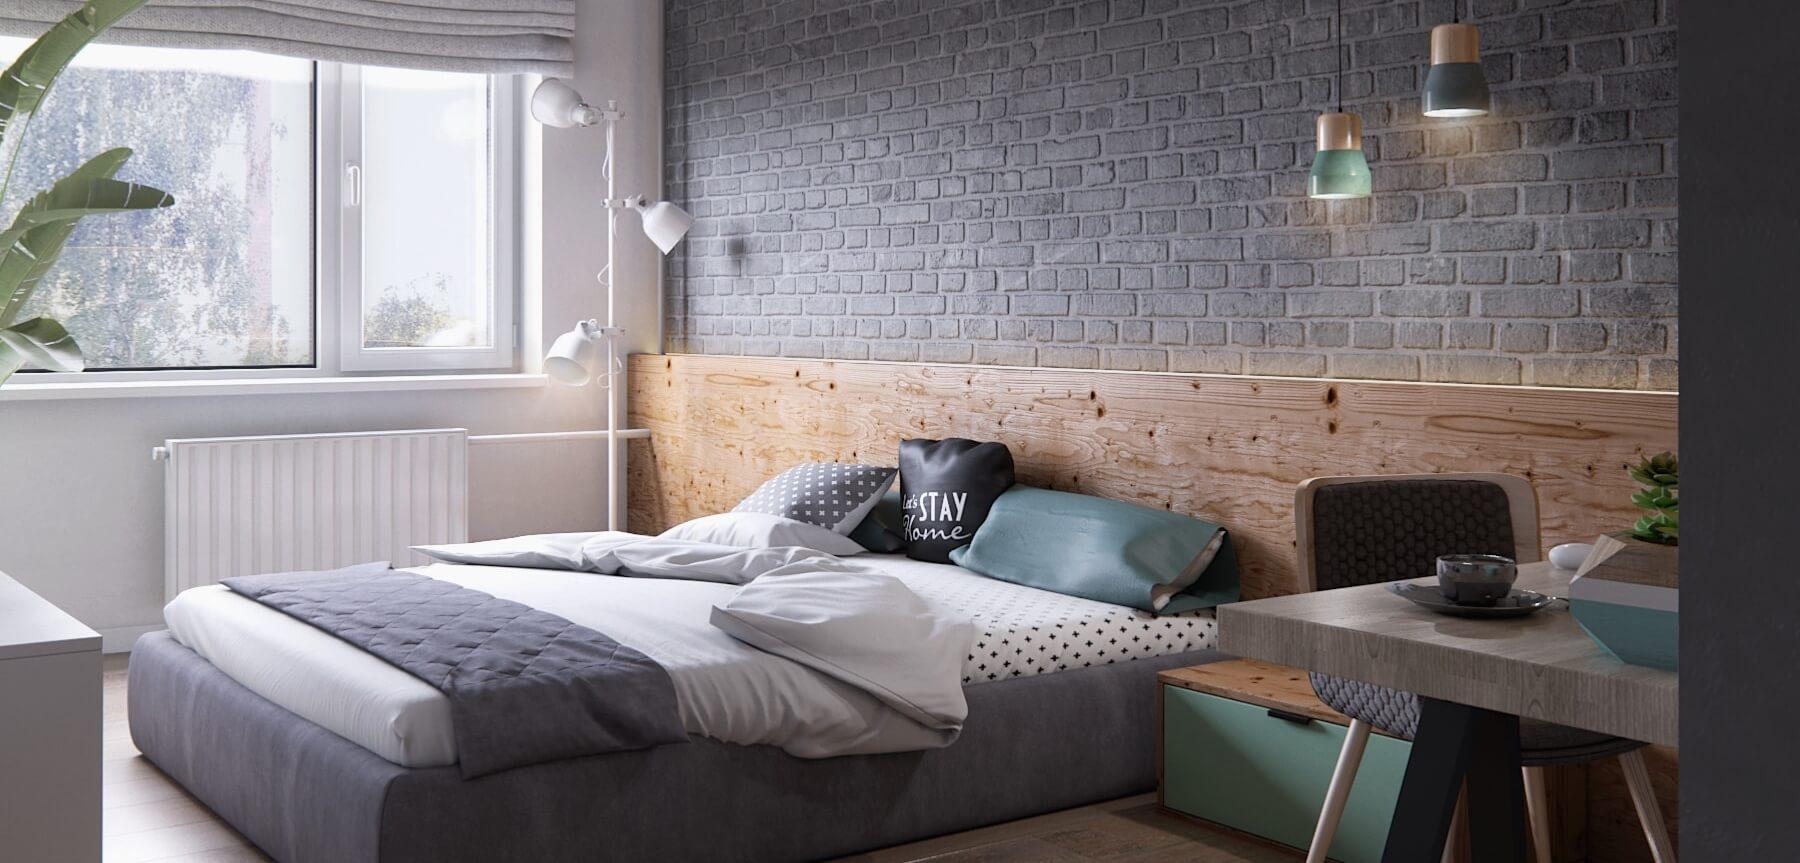 Laranko-bedroom1-1800x863 (1)